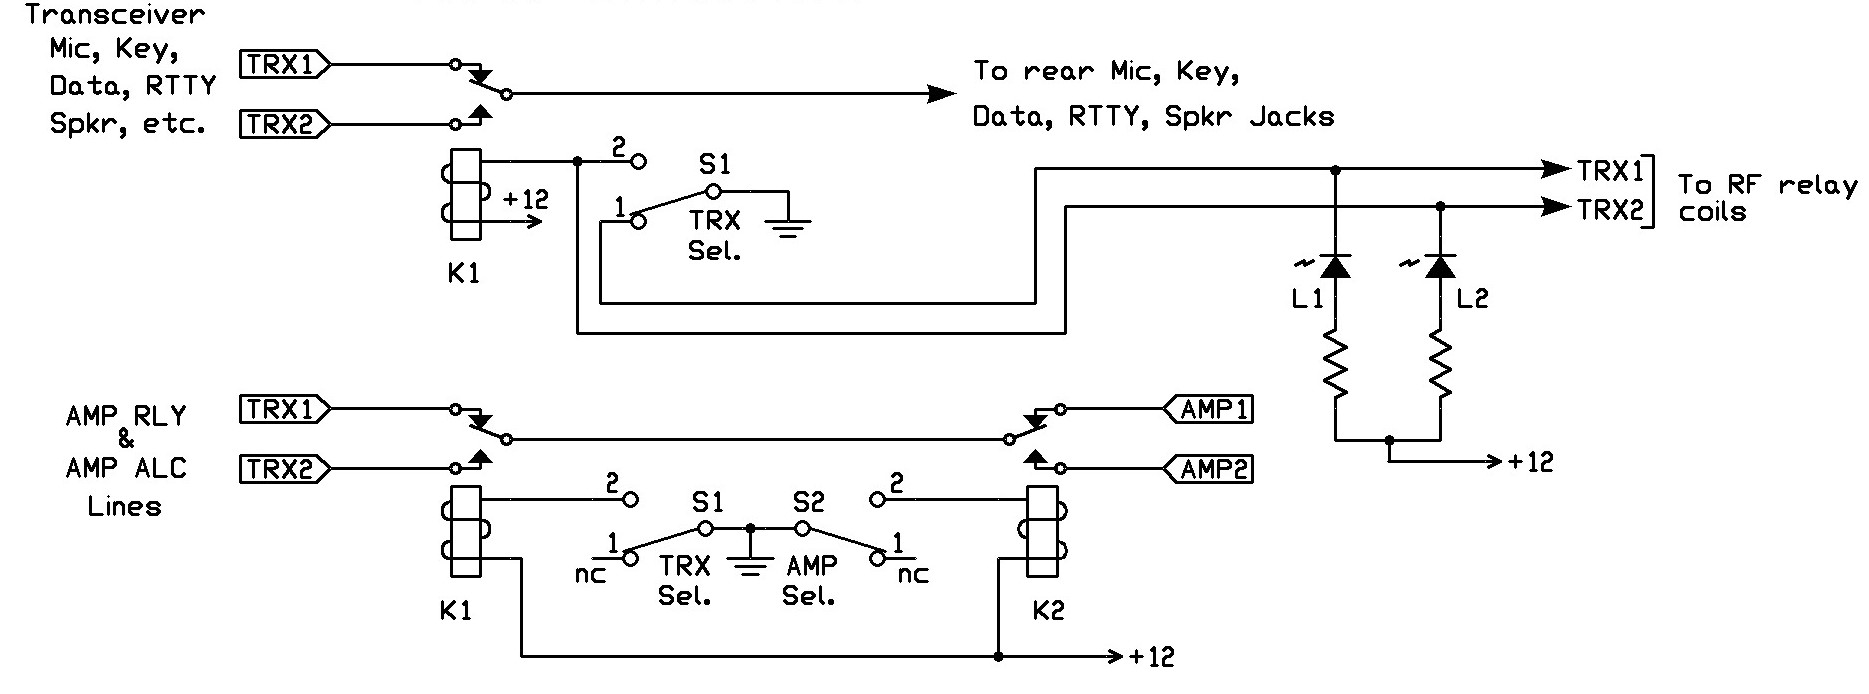 dpdt relay wiring diagram 2003 jetta headlight w8zr multicontroller technical description